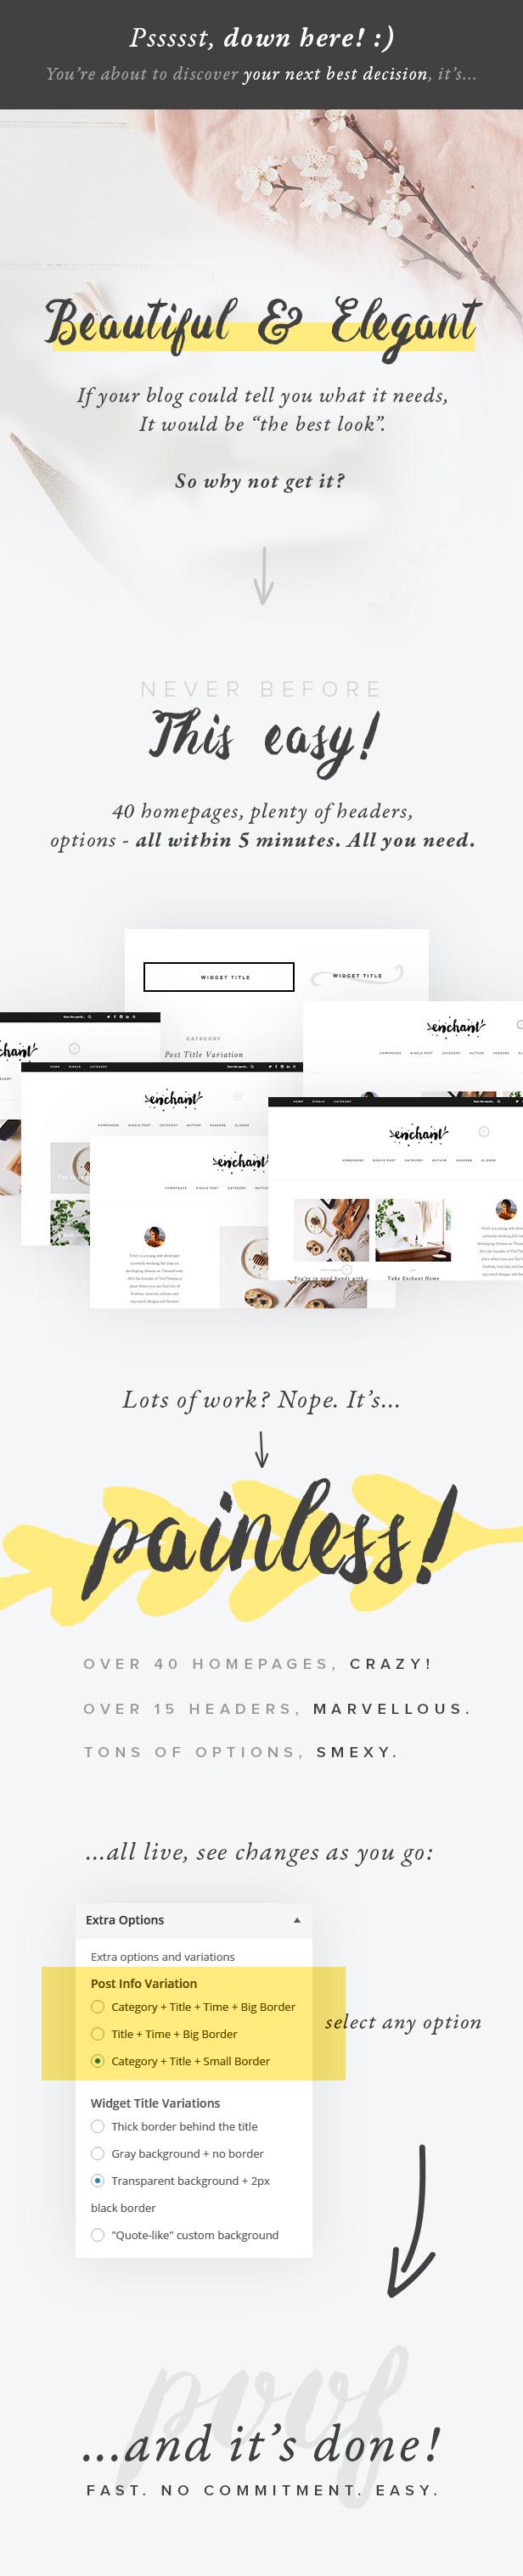 Enchant - Multi-Concept WordPress Blog Theme - 1